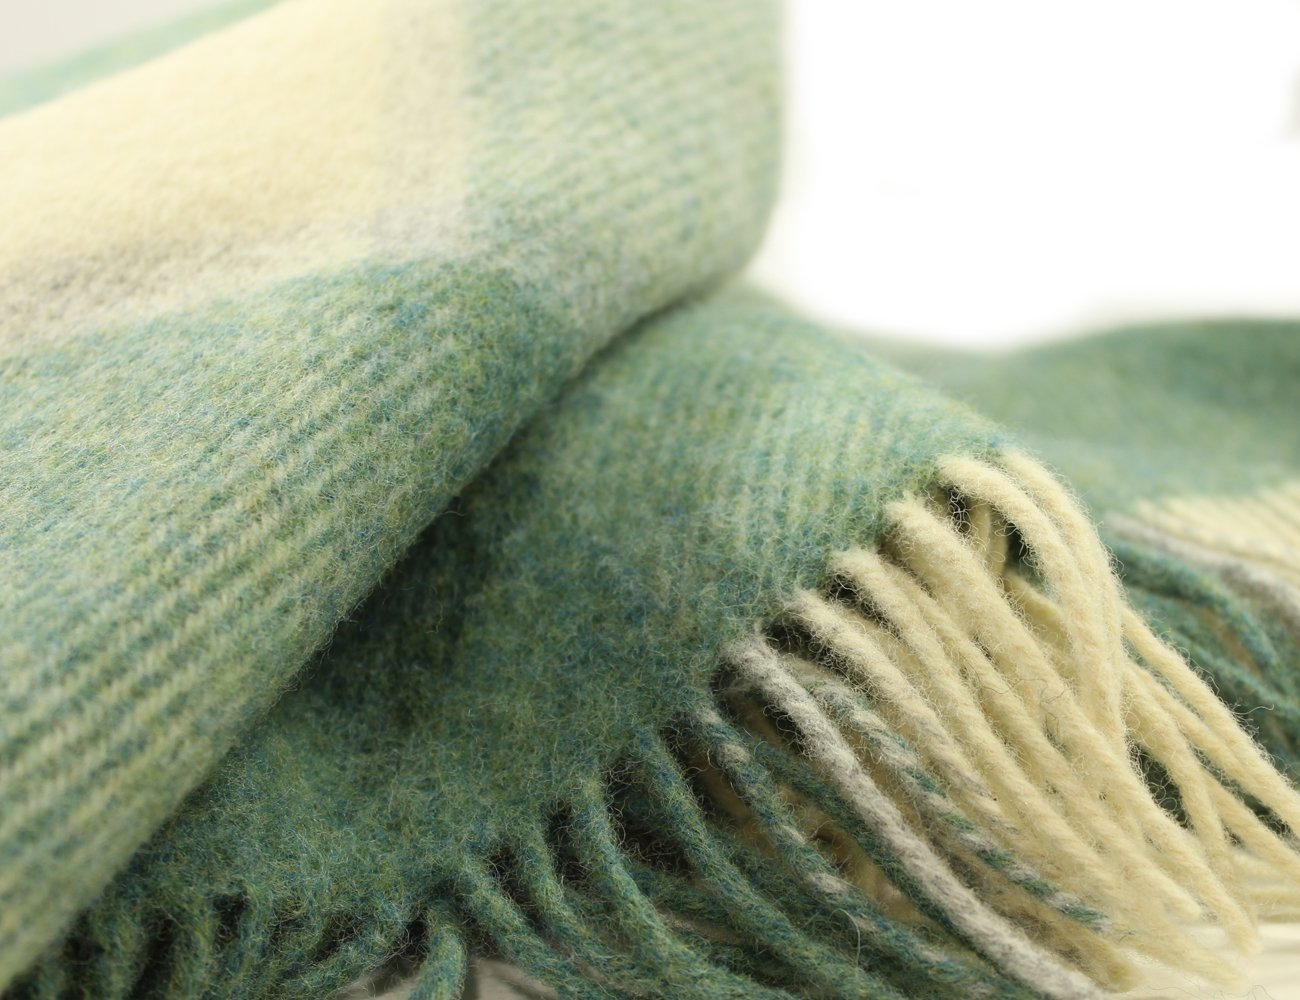 "John Hanly /& Co Irish Wool Blanket Knee Throw Purple /& Black Plaid Small 54/"" Long x 45/"" Wide Fringed Warm Lambswool Made in Ireland"